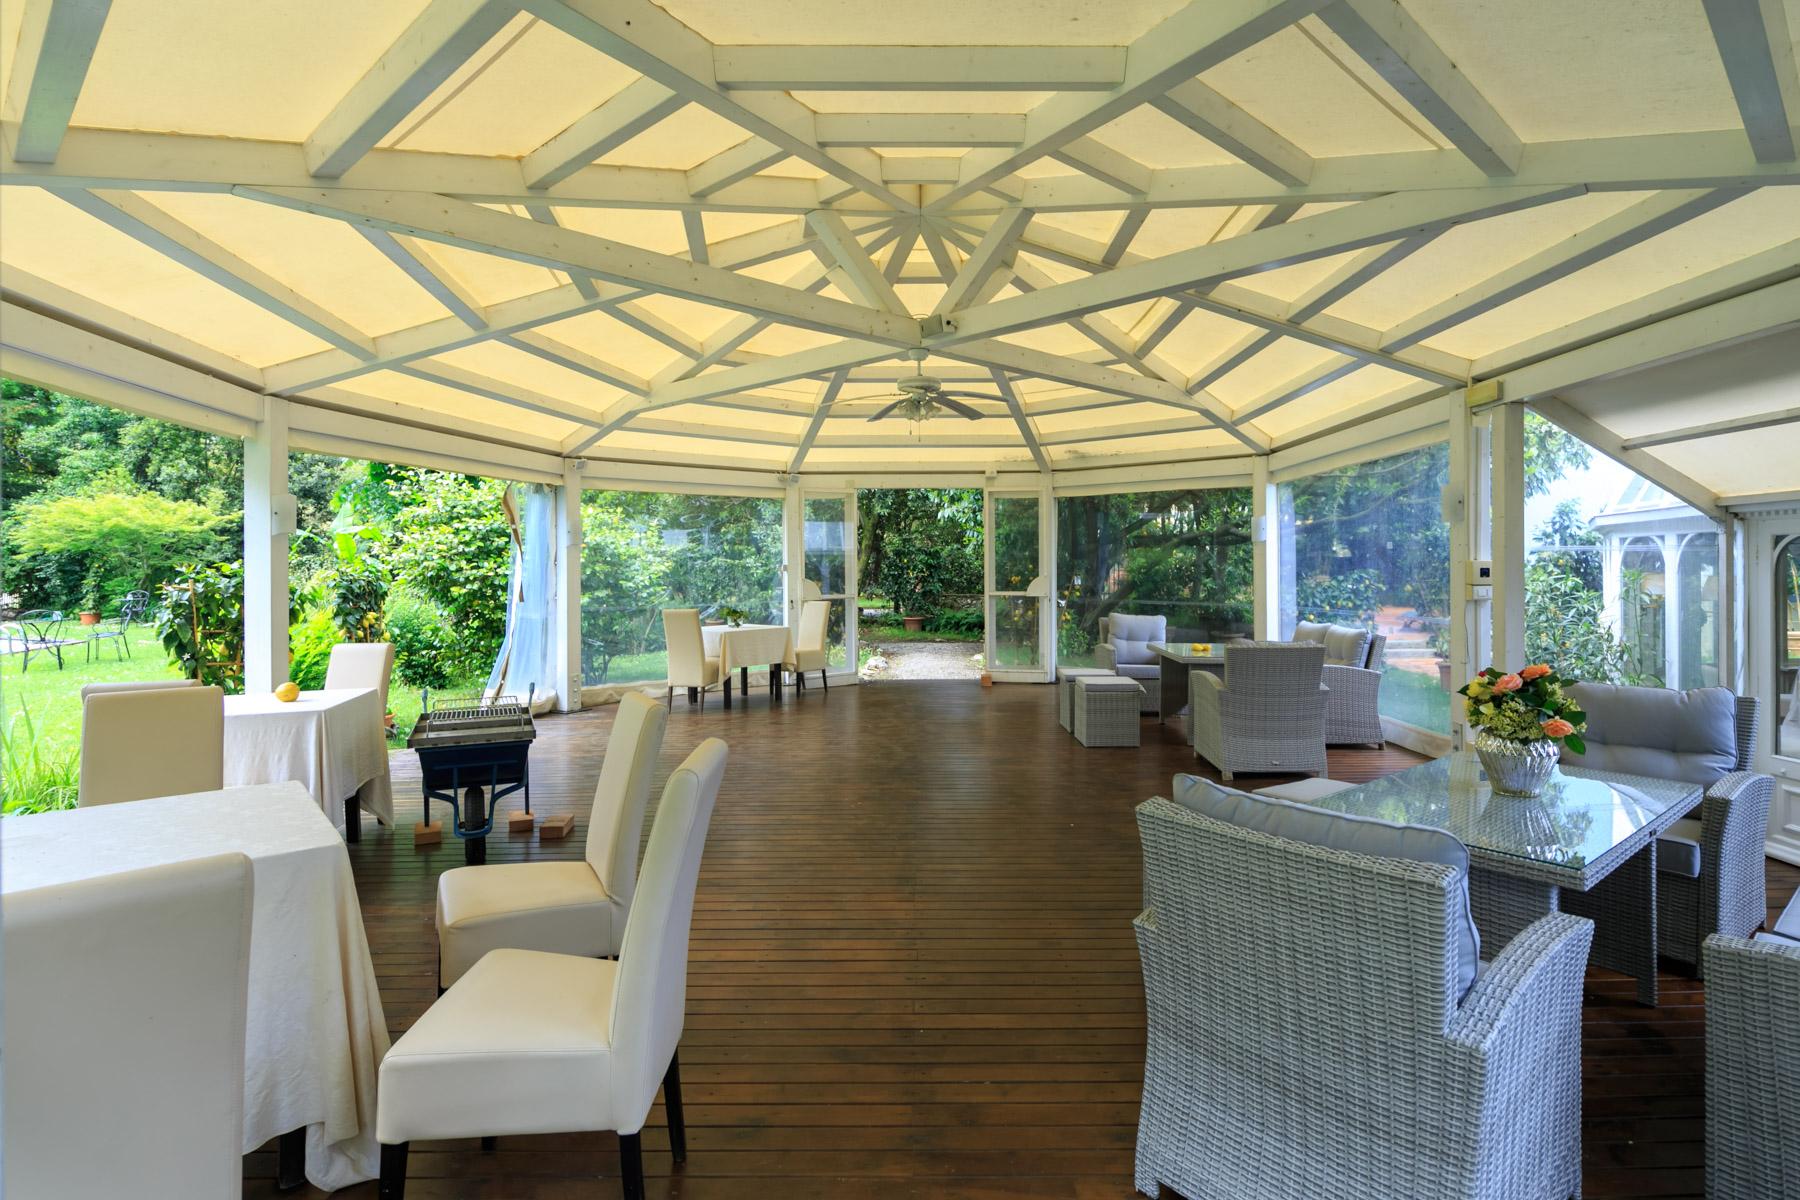 Villa in Vendita a Lucca: 5 locali, 700 mq - Foto 4